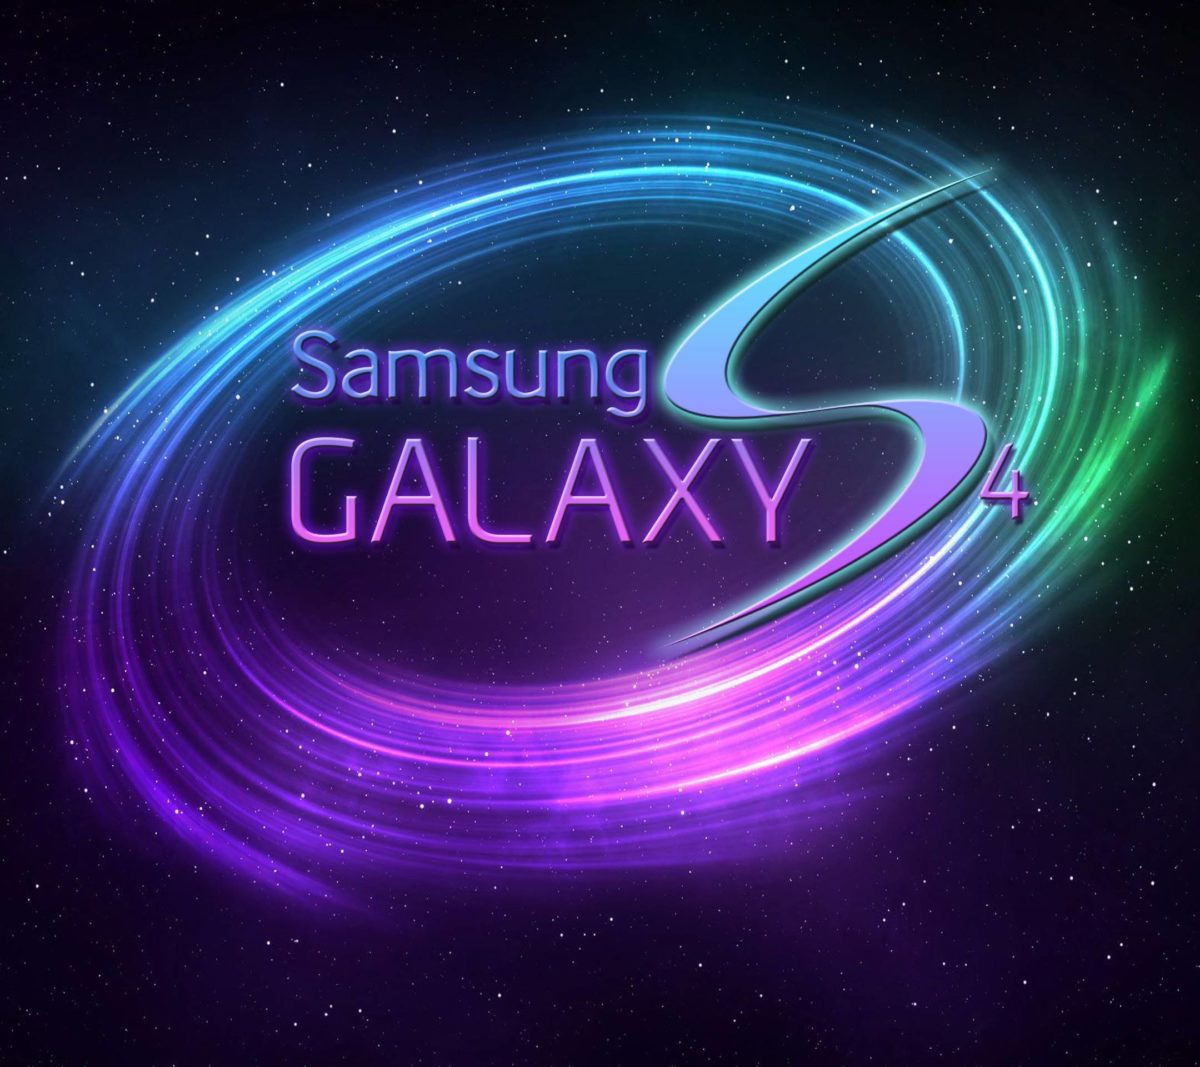 Samsung Galaxy S4 Logo Vector | Gambar Gadget